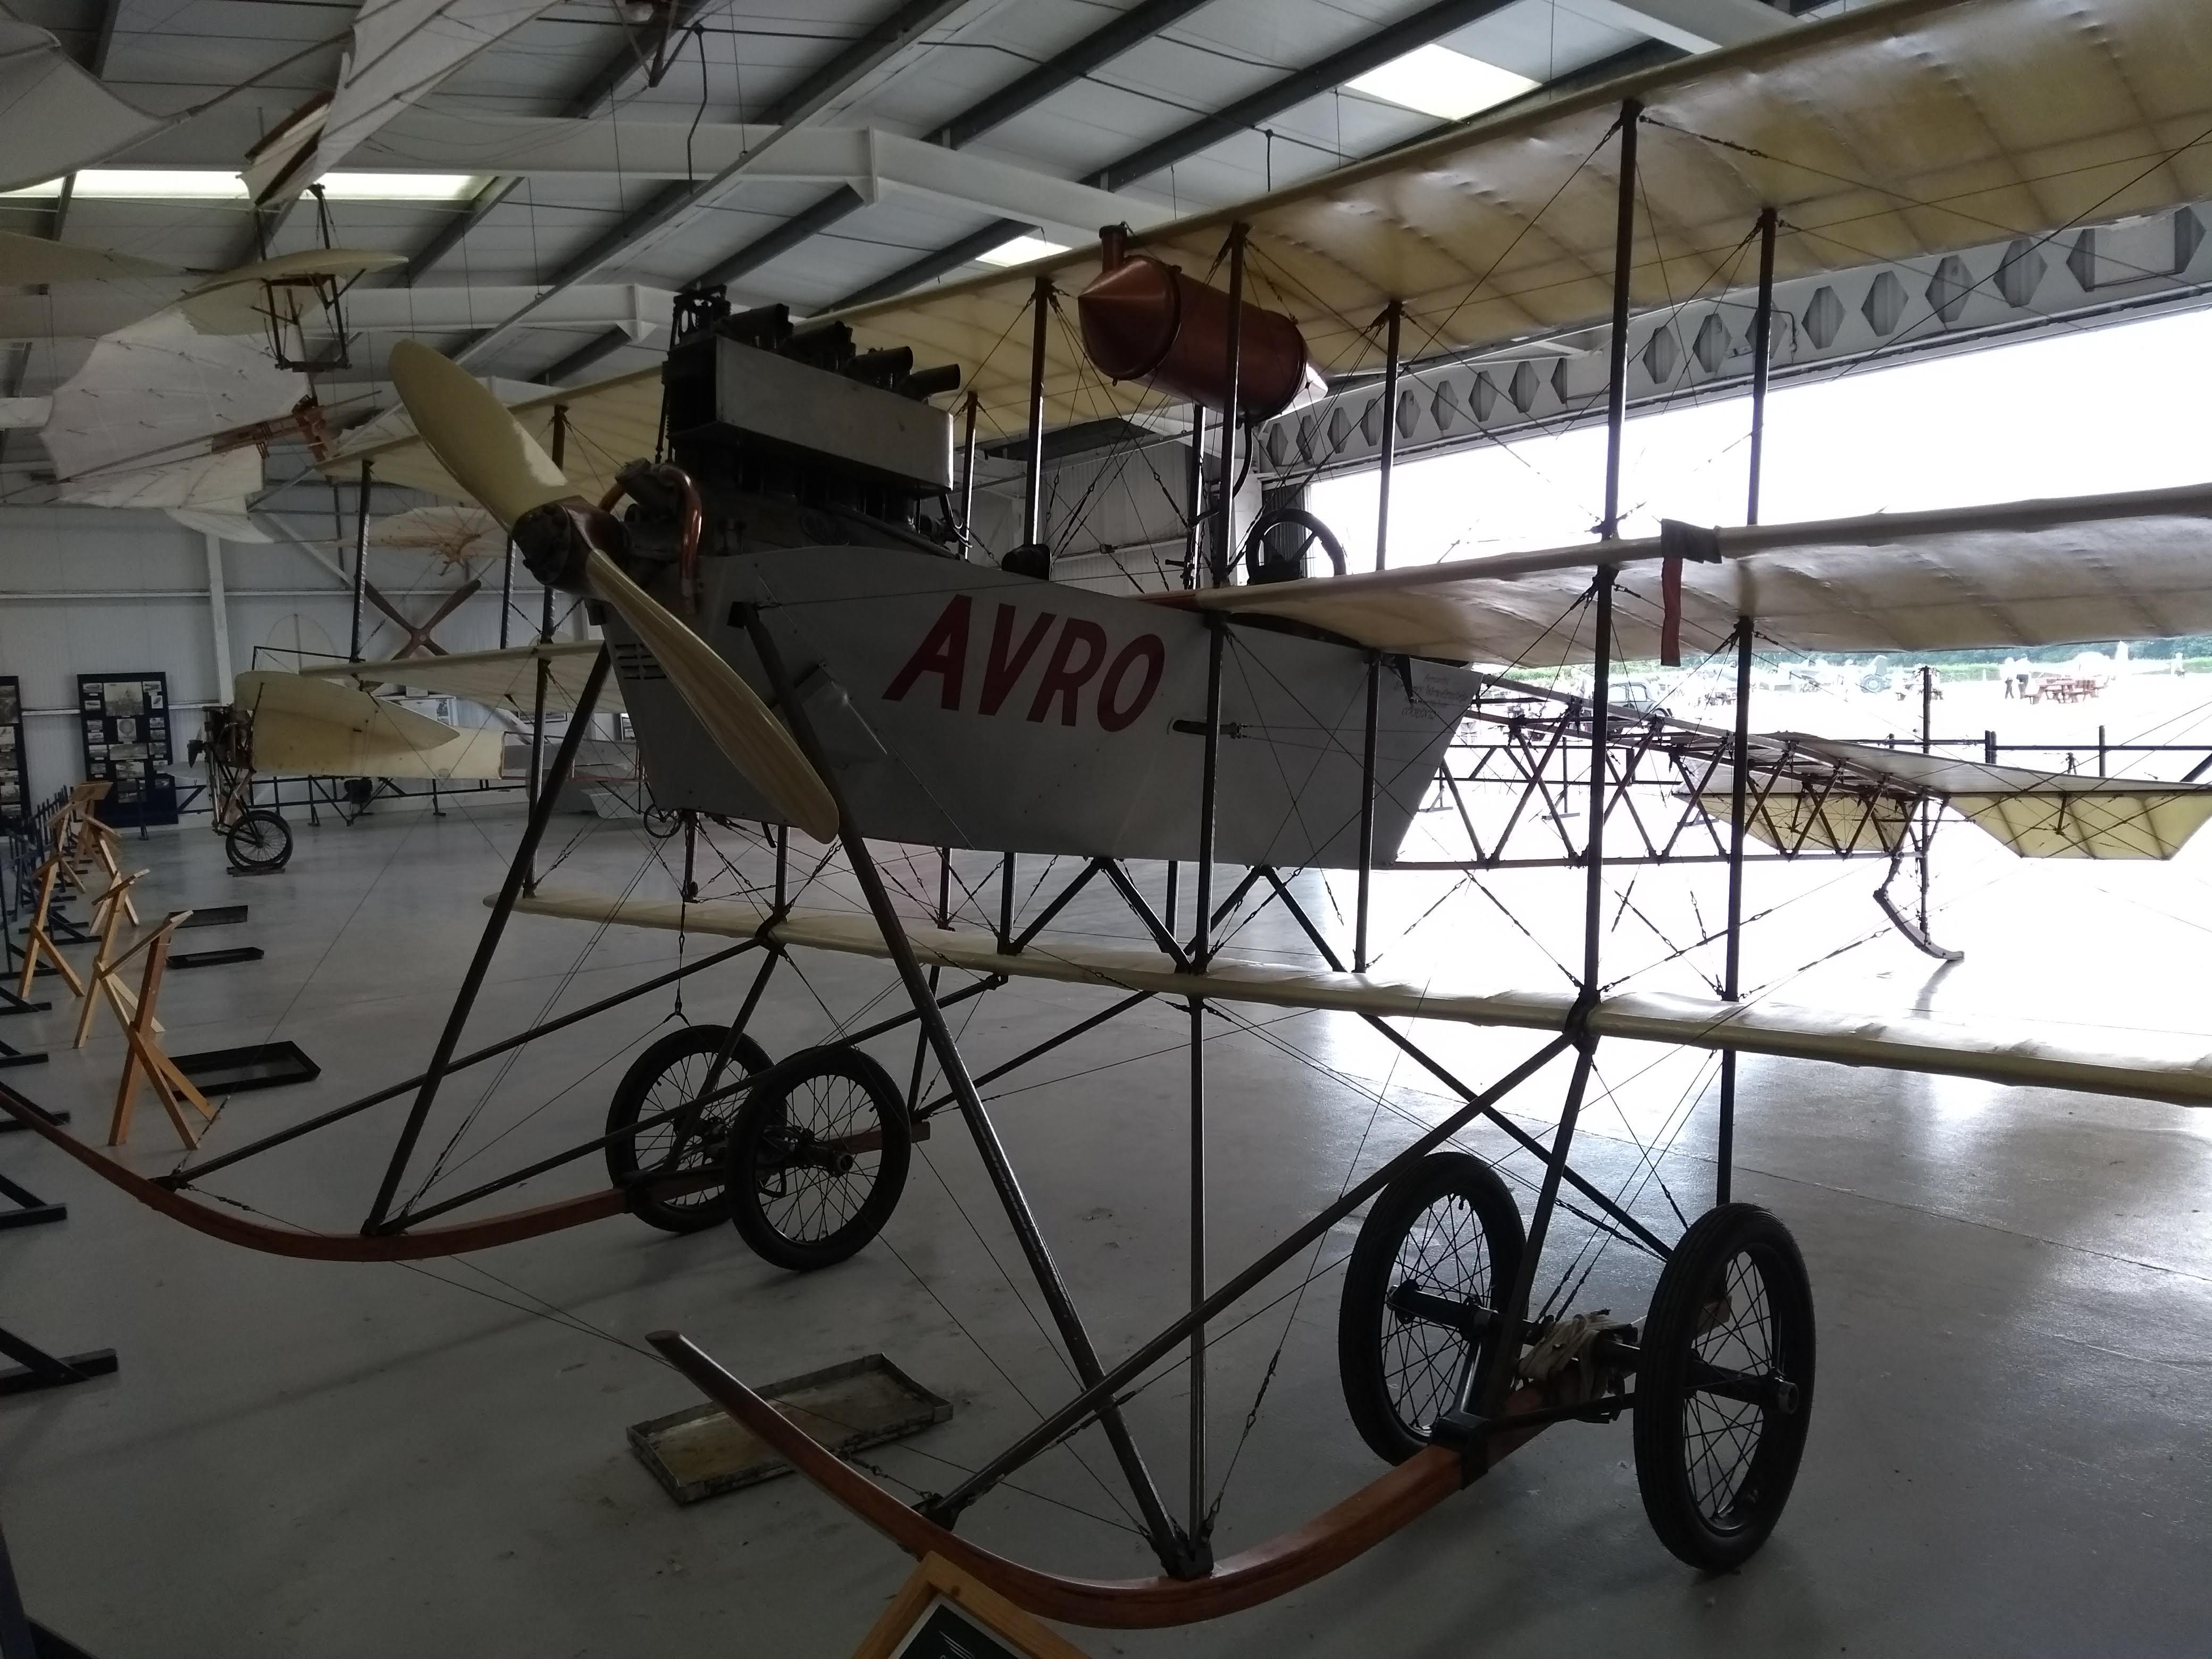 9_Avro Triplane